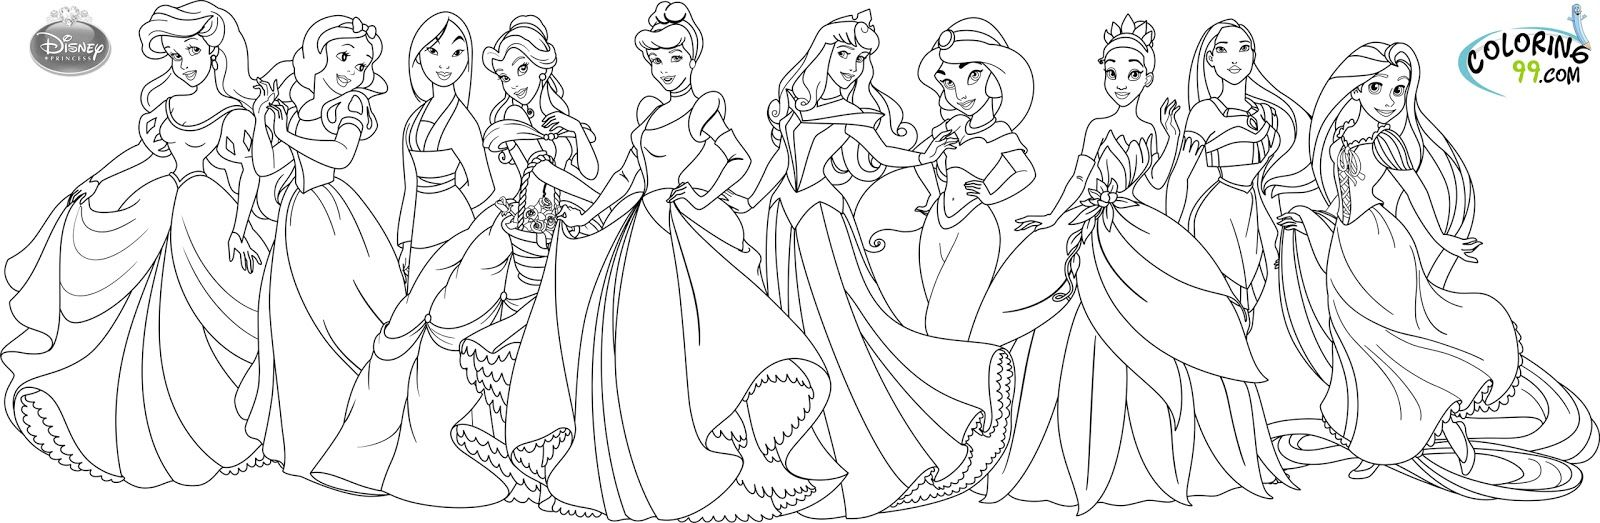 Princesses Disney Princess Coloring Pages Disney Princess Colors Princess Coloring Pages